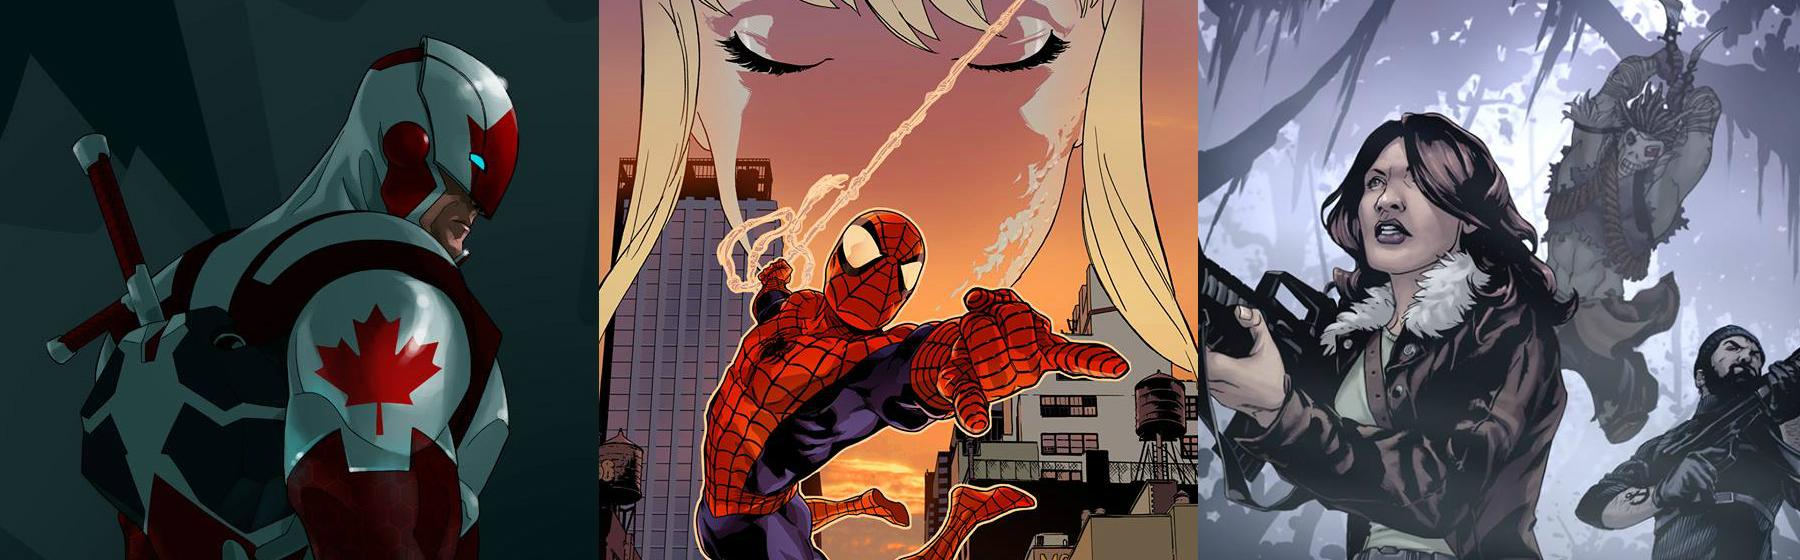 Kalman Andrasofszky Spider-Man  Captain Canuck